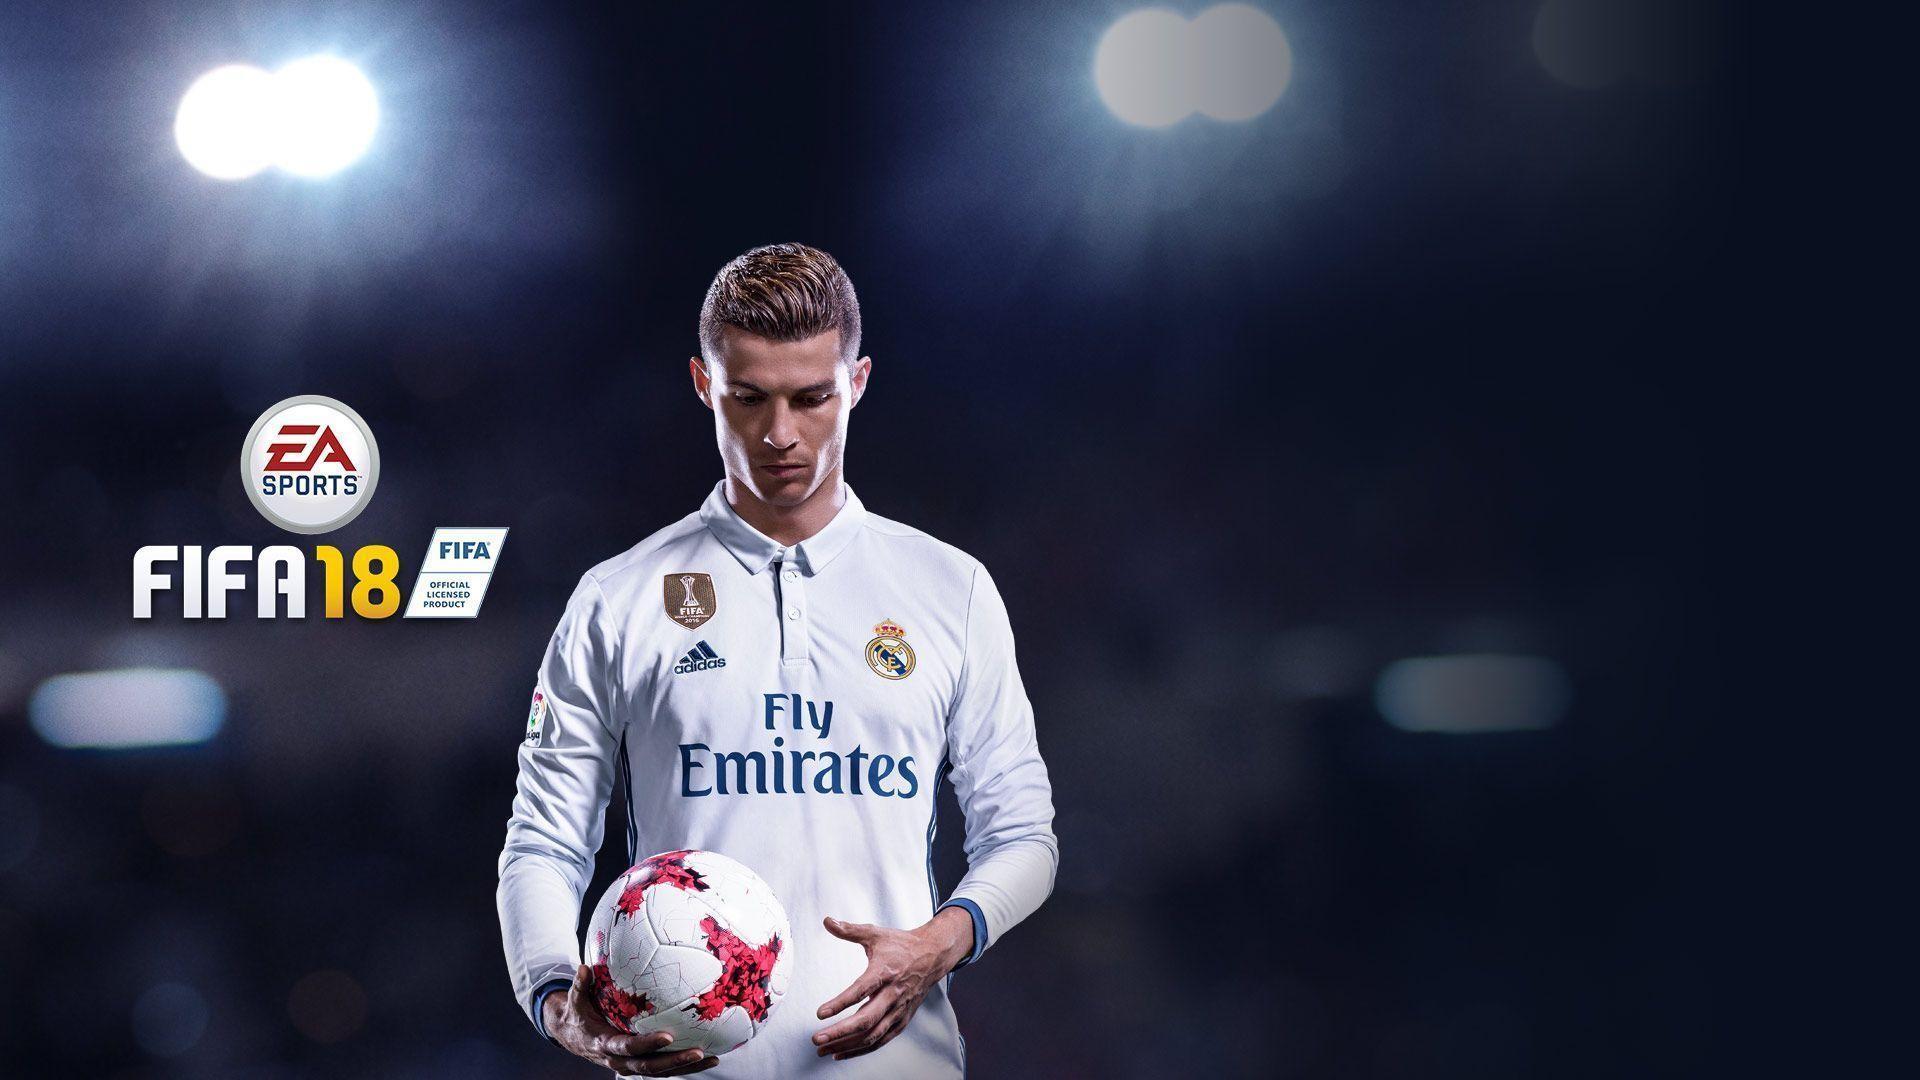 Res: 1920x1080, FIFA 18 Cover Star Cristiano Ronaldo - High Definition Cover .